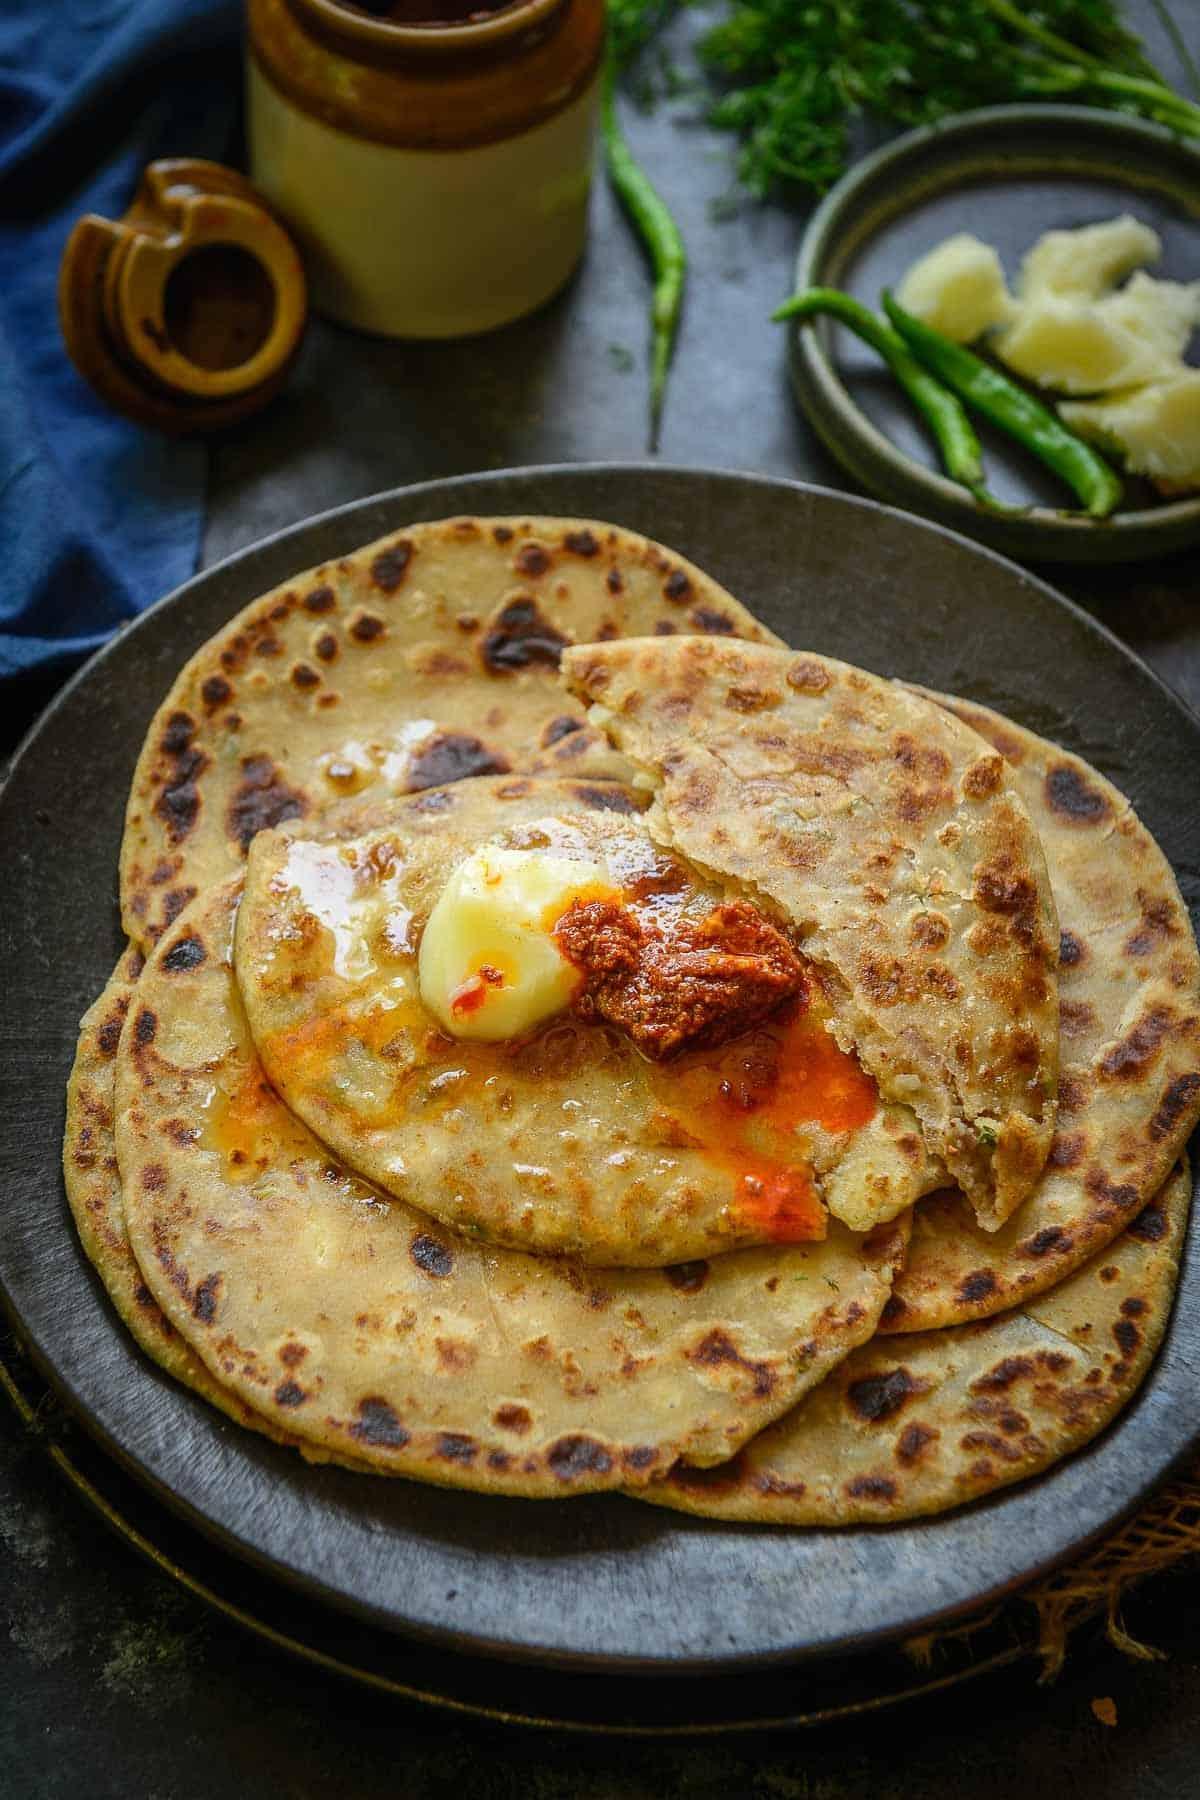 Aloo paratha served on a plate.